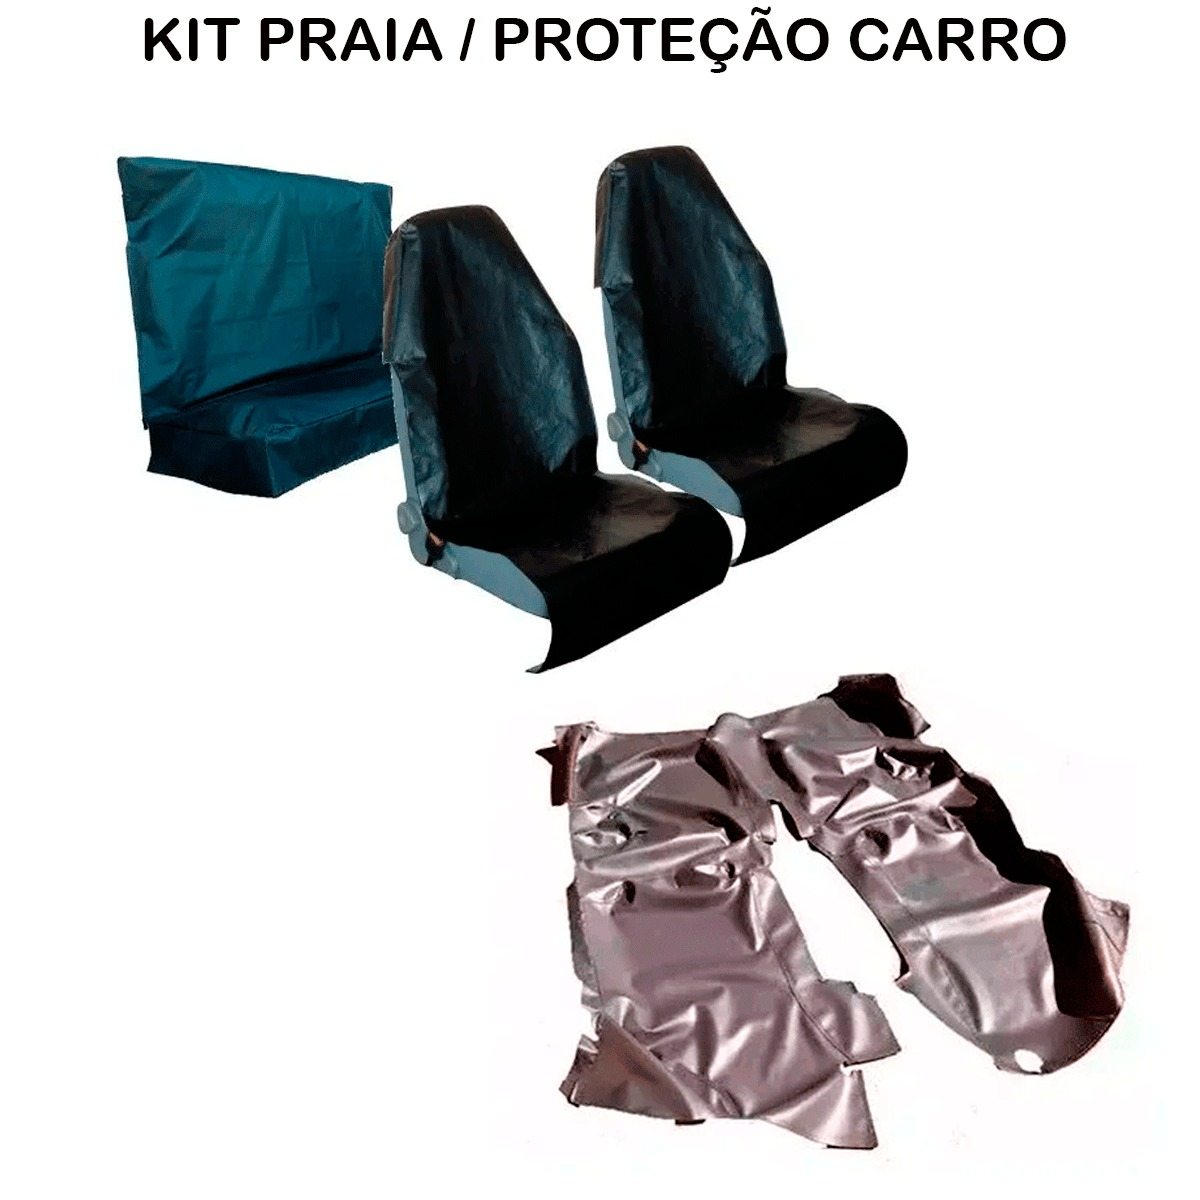 Tapete Em Vinil Mitsubishi L200 Dupla Outdoor + Capa Banco Protecao Banco Areia Suor Academia